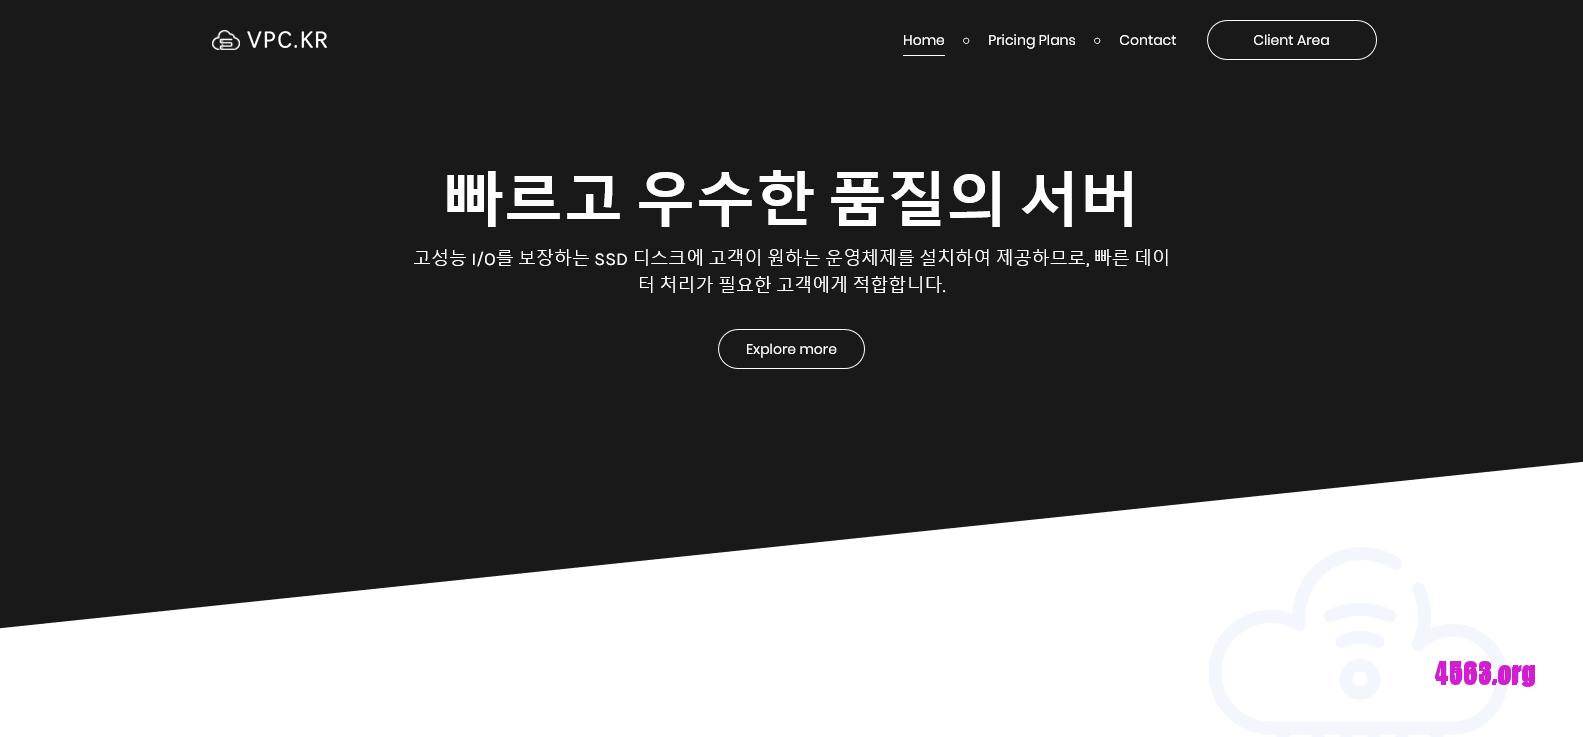 VPCKR韩国KVM VPS@1G内存/20GB SSD空间/500GB流量@$18.99/月